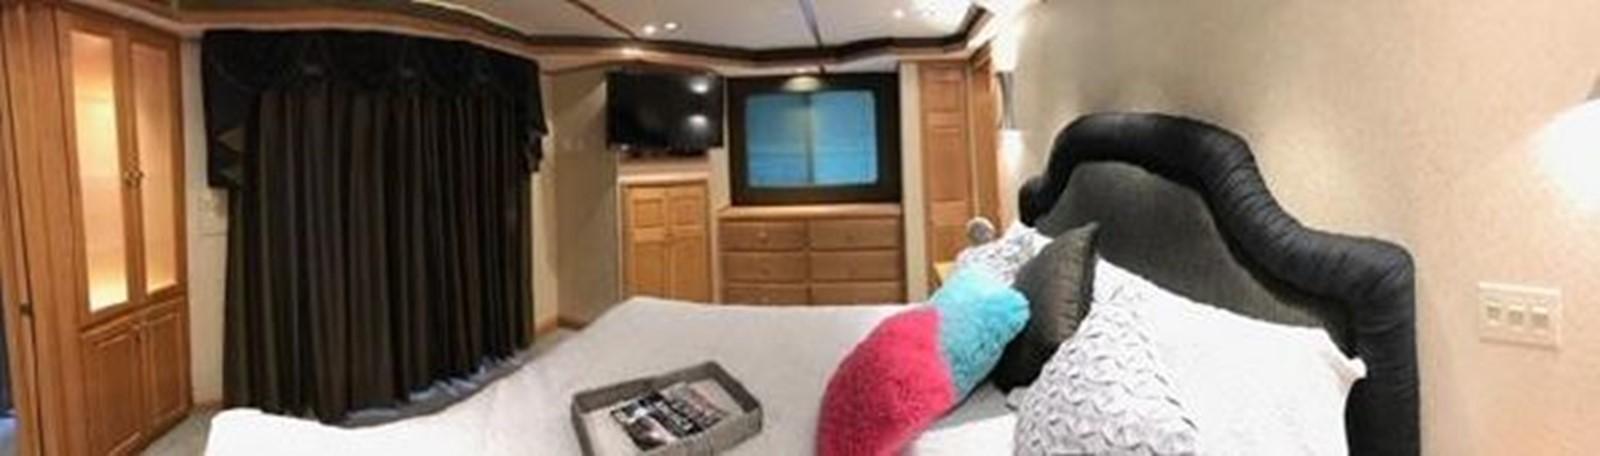 2003 FANTASY YACHTS  Houseboat 2476967